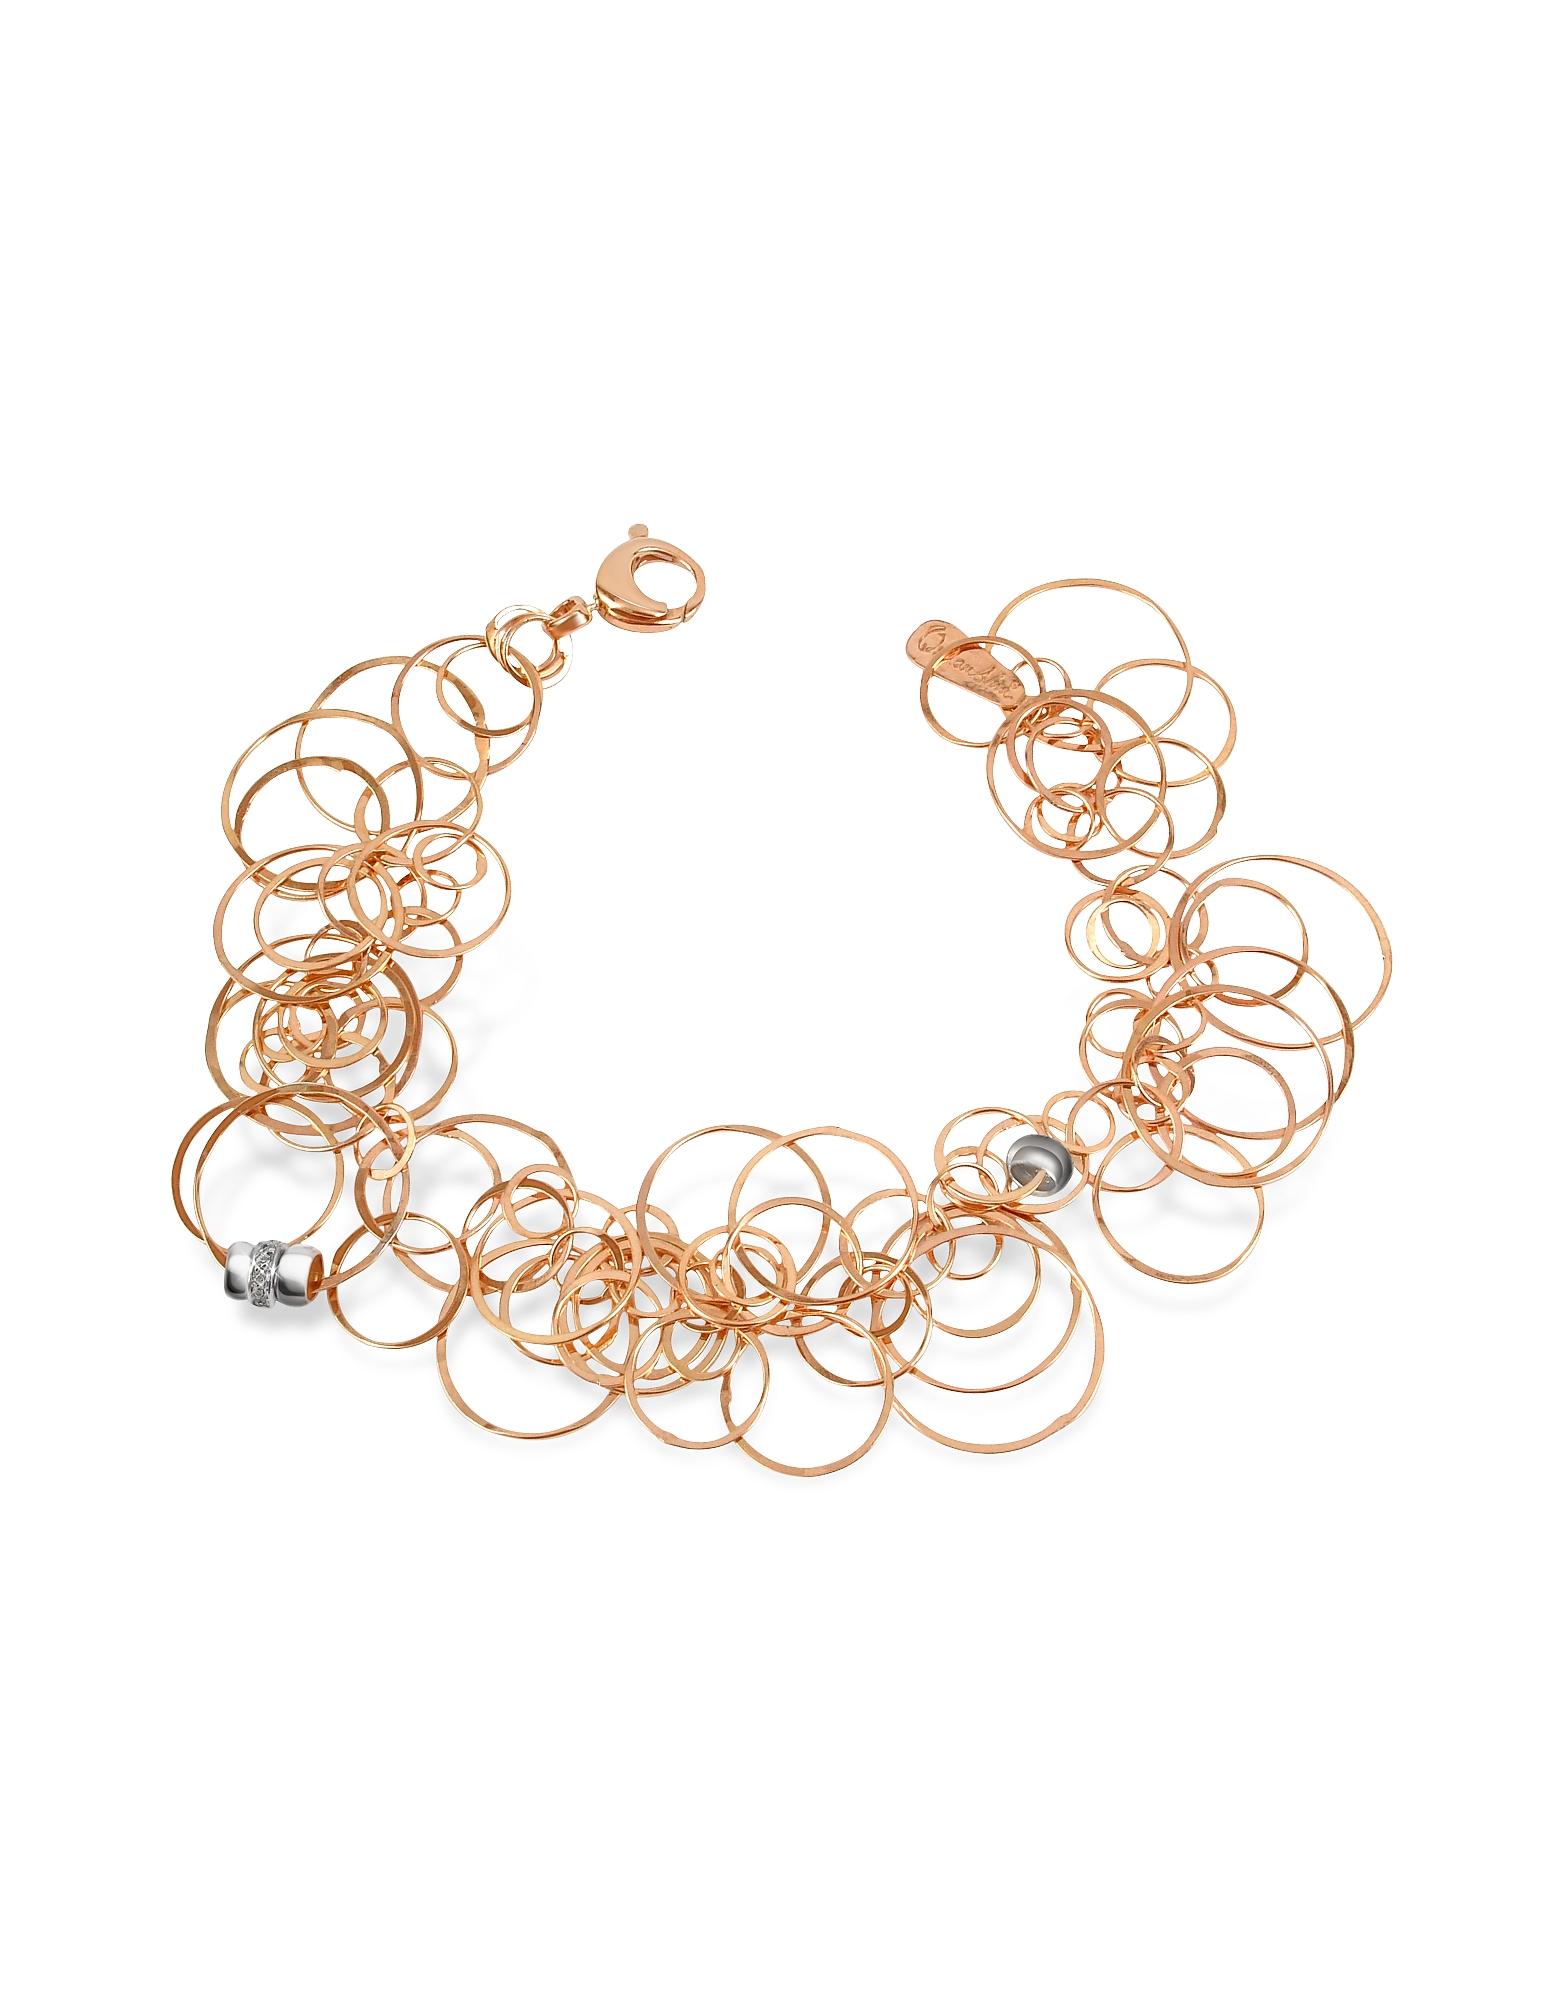 Orlando Orlandini Bracelets, Scintille - Diamond 18K Rose Gold Bracelet